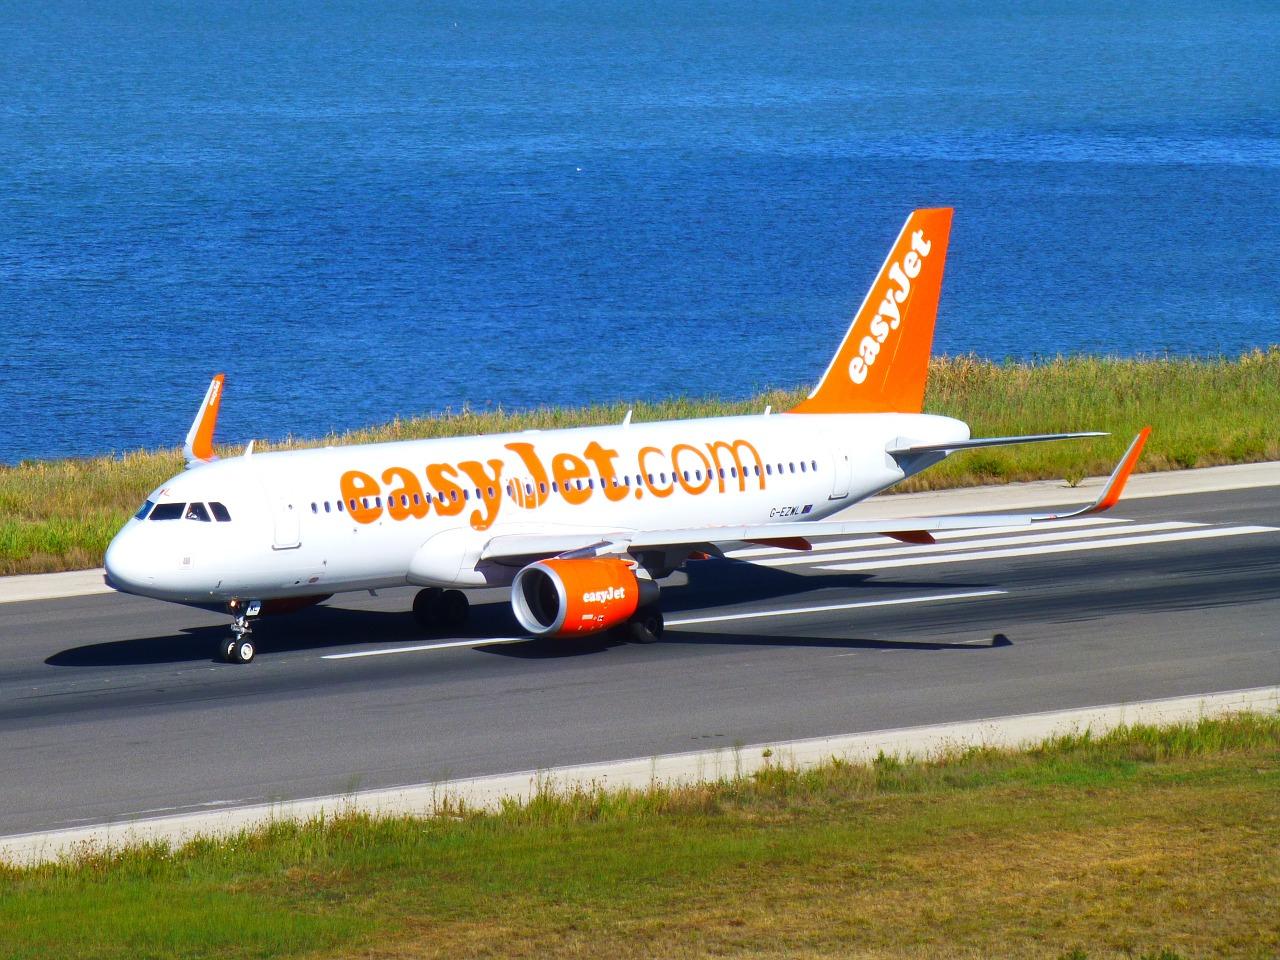 easy jet aereo